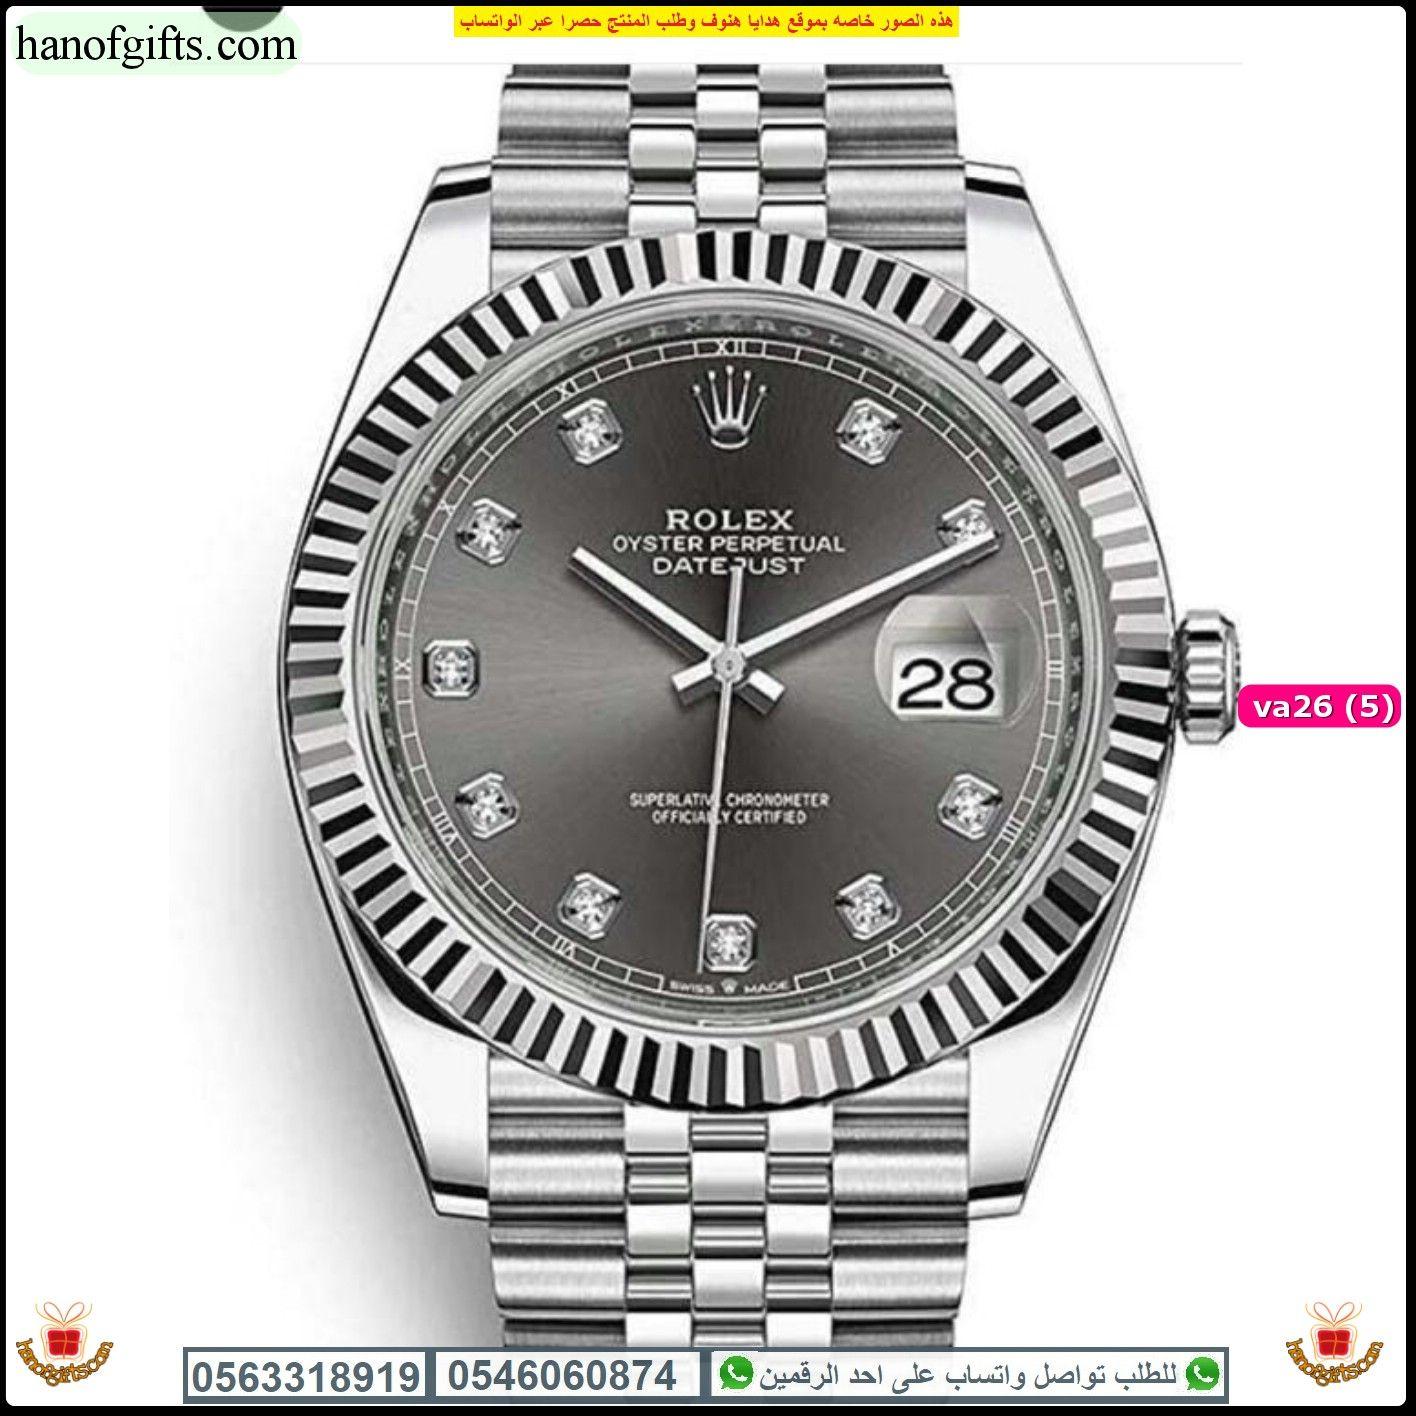 ساعات رولكس كلاسيك رجالي Rolex بقفل عريض مع الملحقات هدايا هنوف Rolex Watches Rolex Accessories